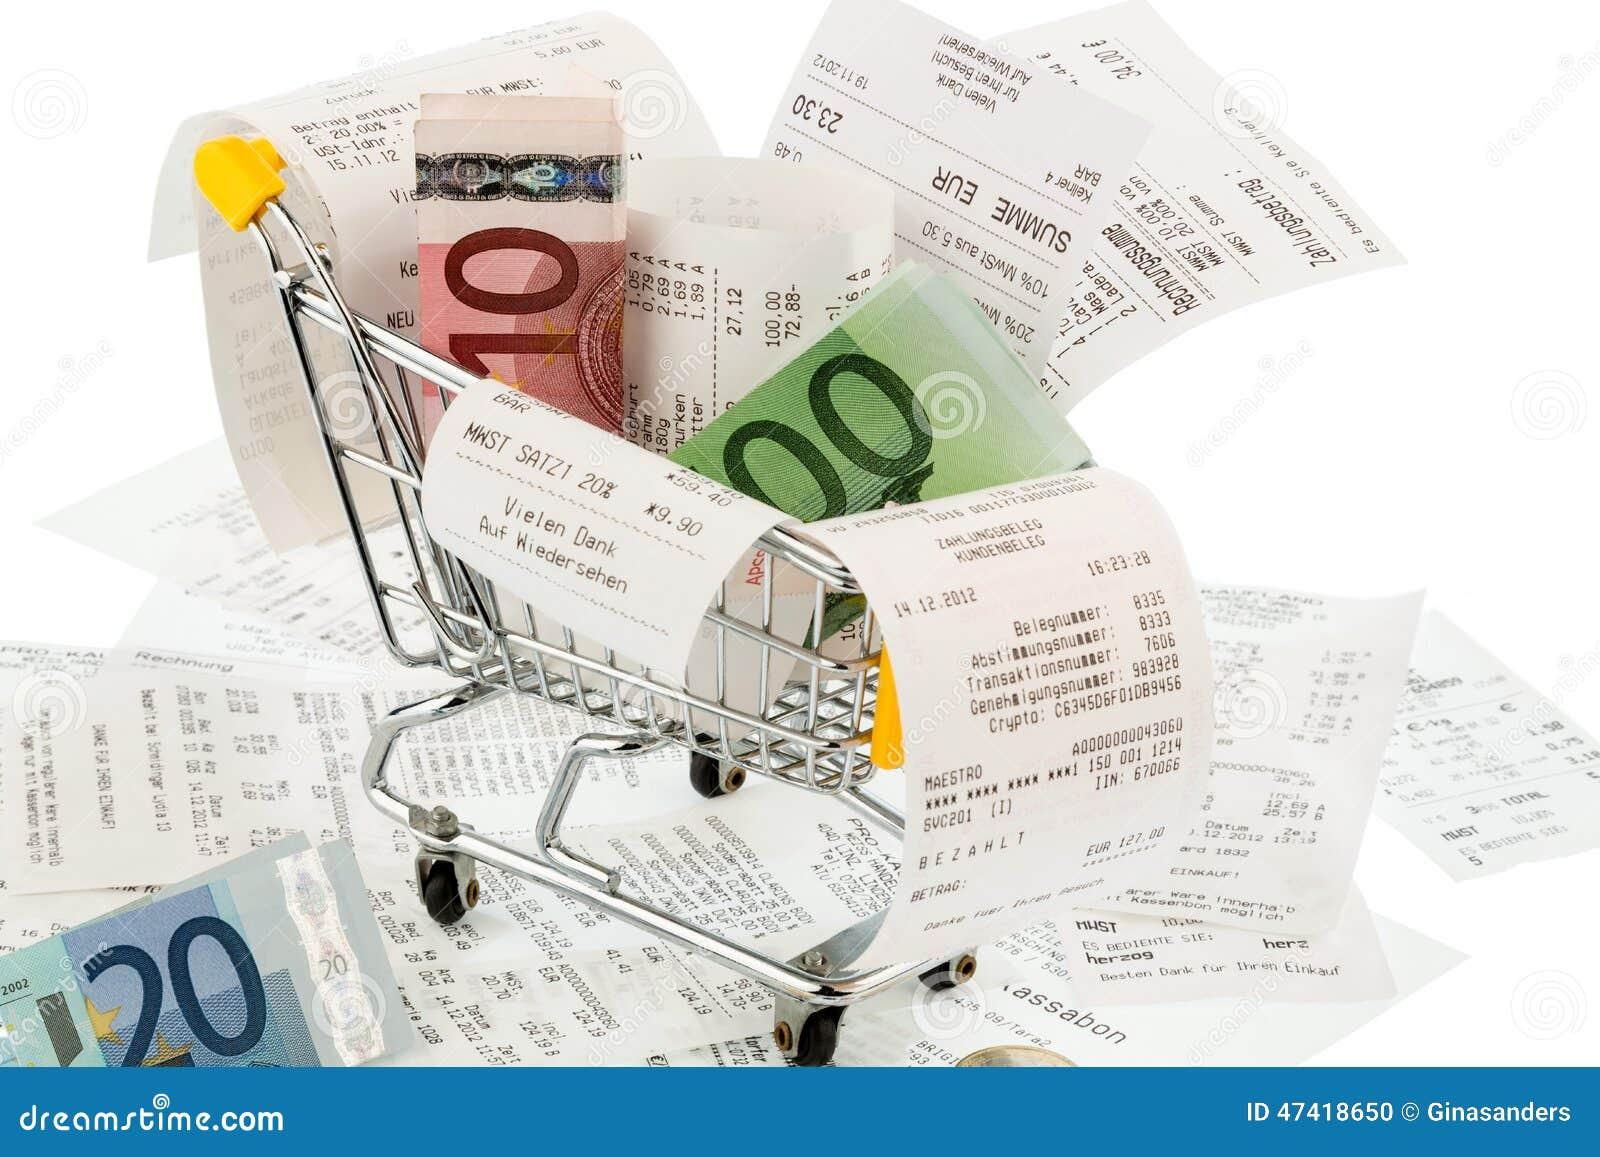 money receipts – Money Receipts